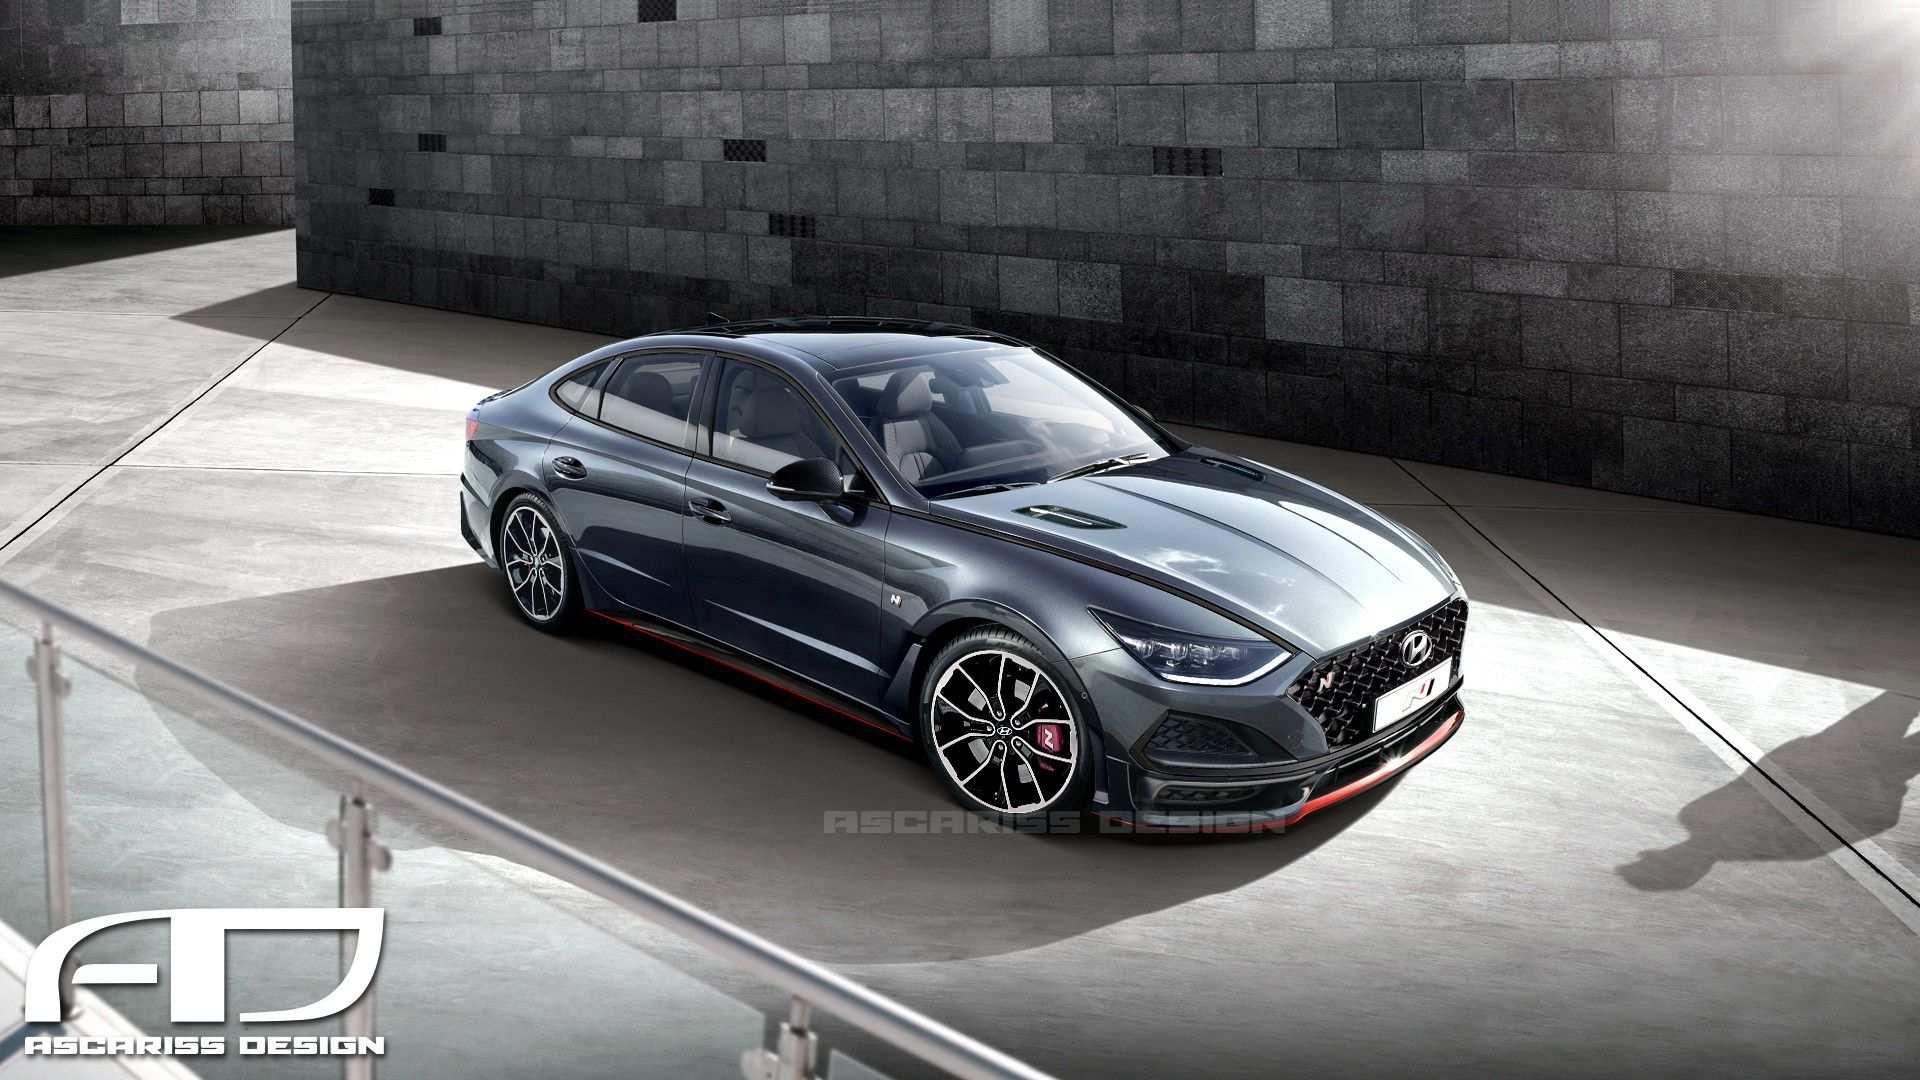 62 Concept of 2020 Hyundai Sonata N Line Exterior with 2020 Hyundai Sonata N Line